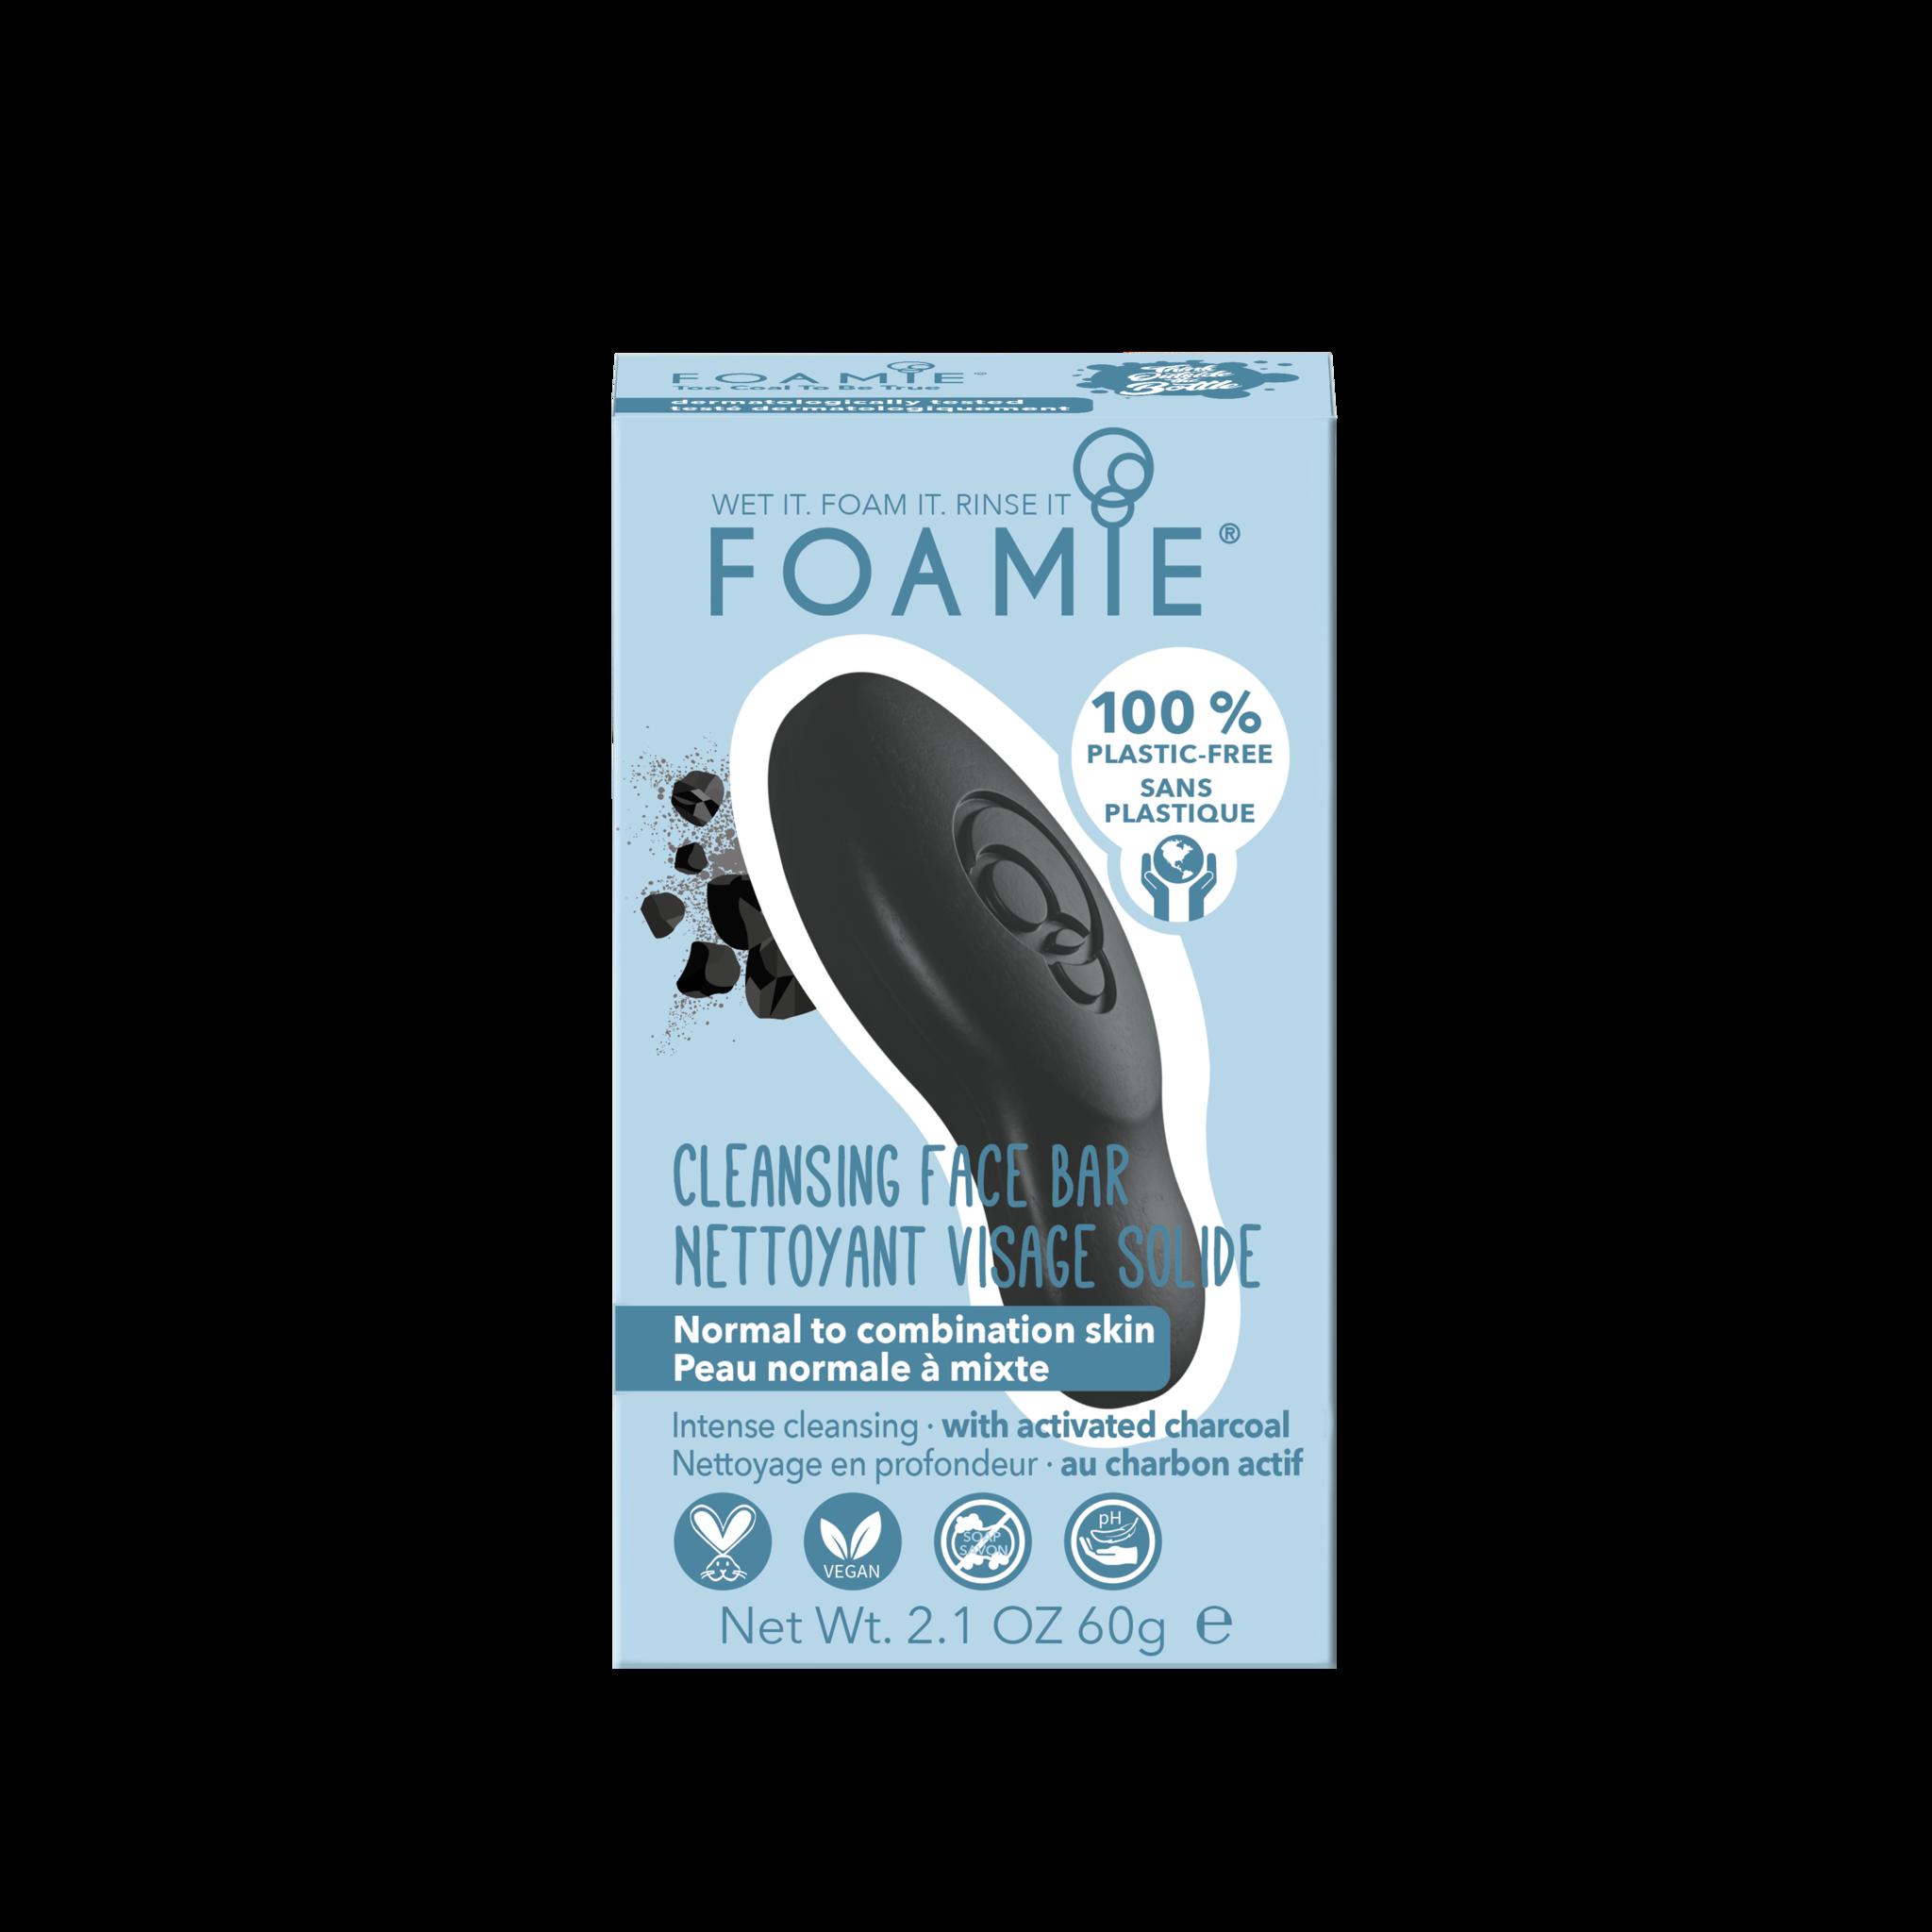 Foamie Nettoyant Visage Too Coal To Be True